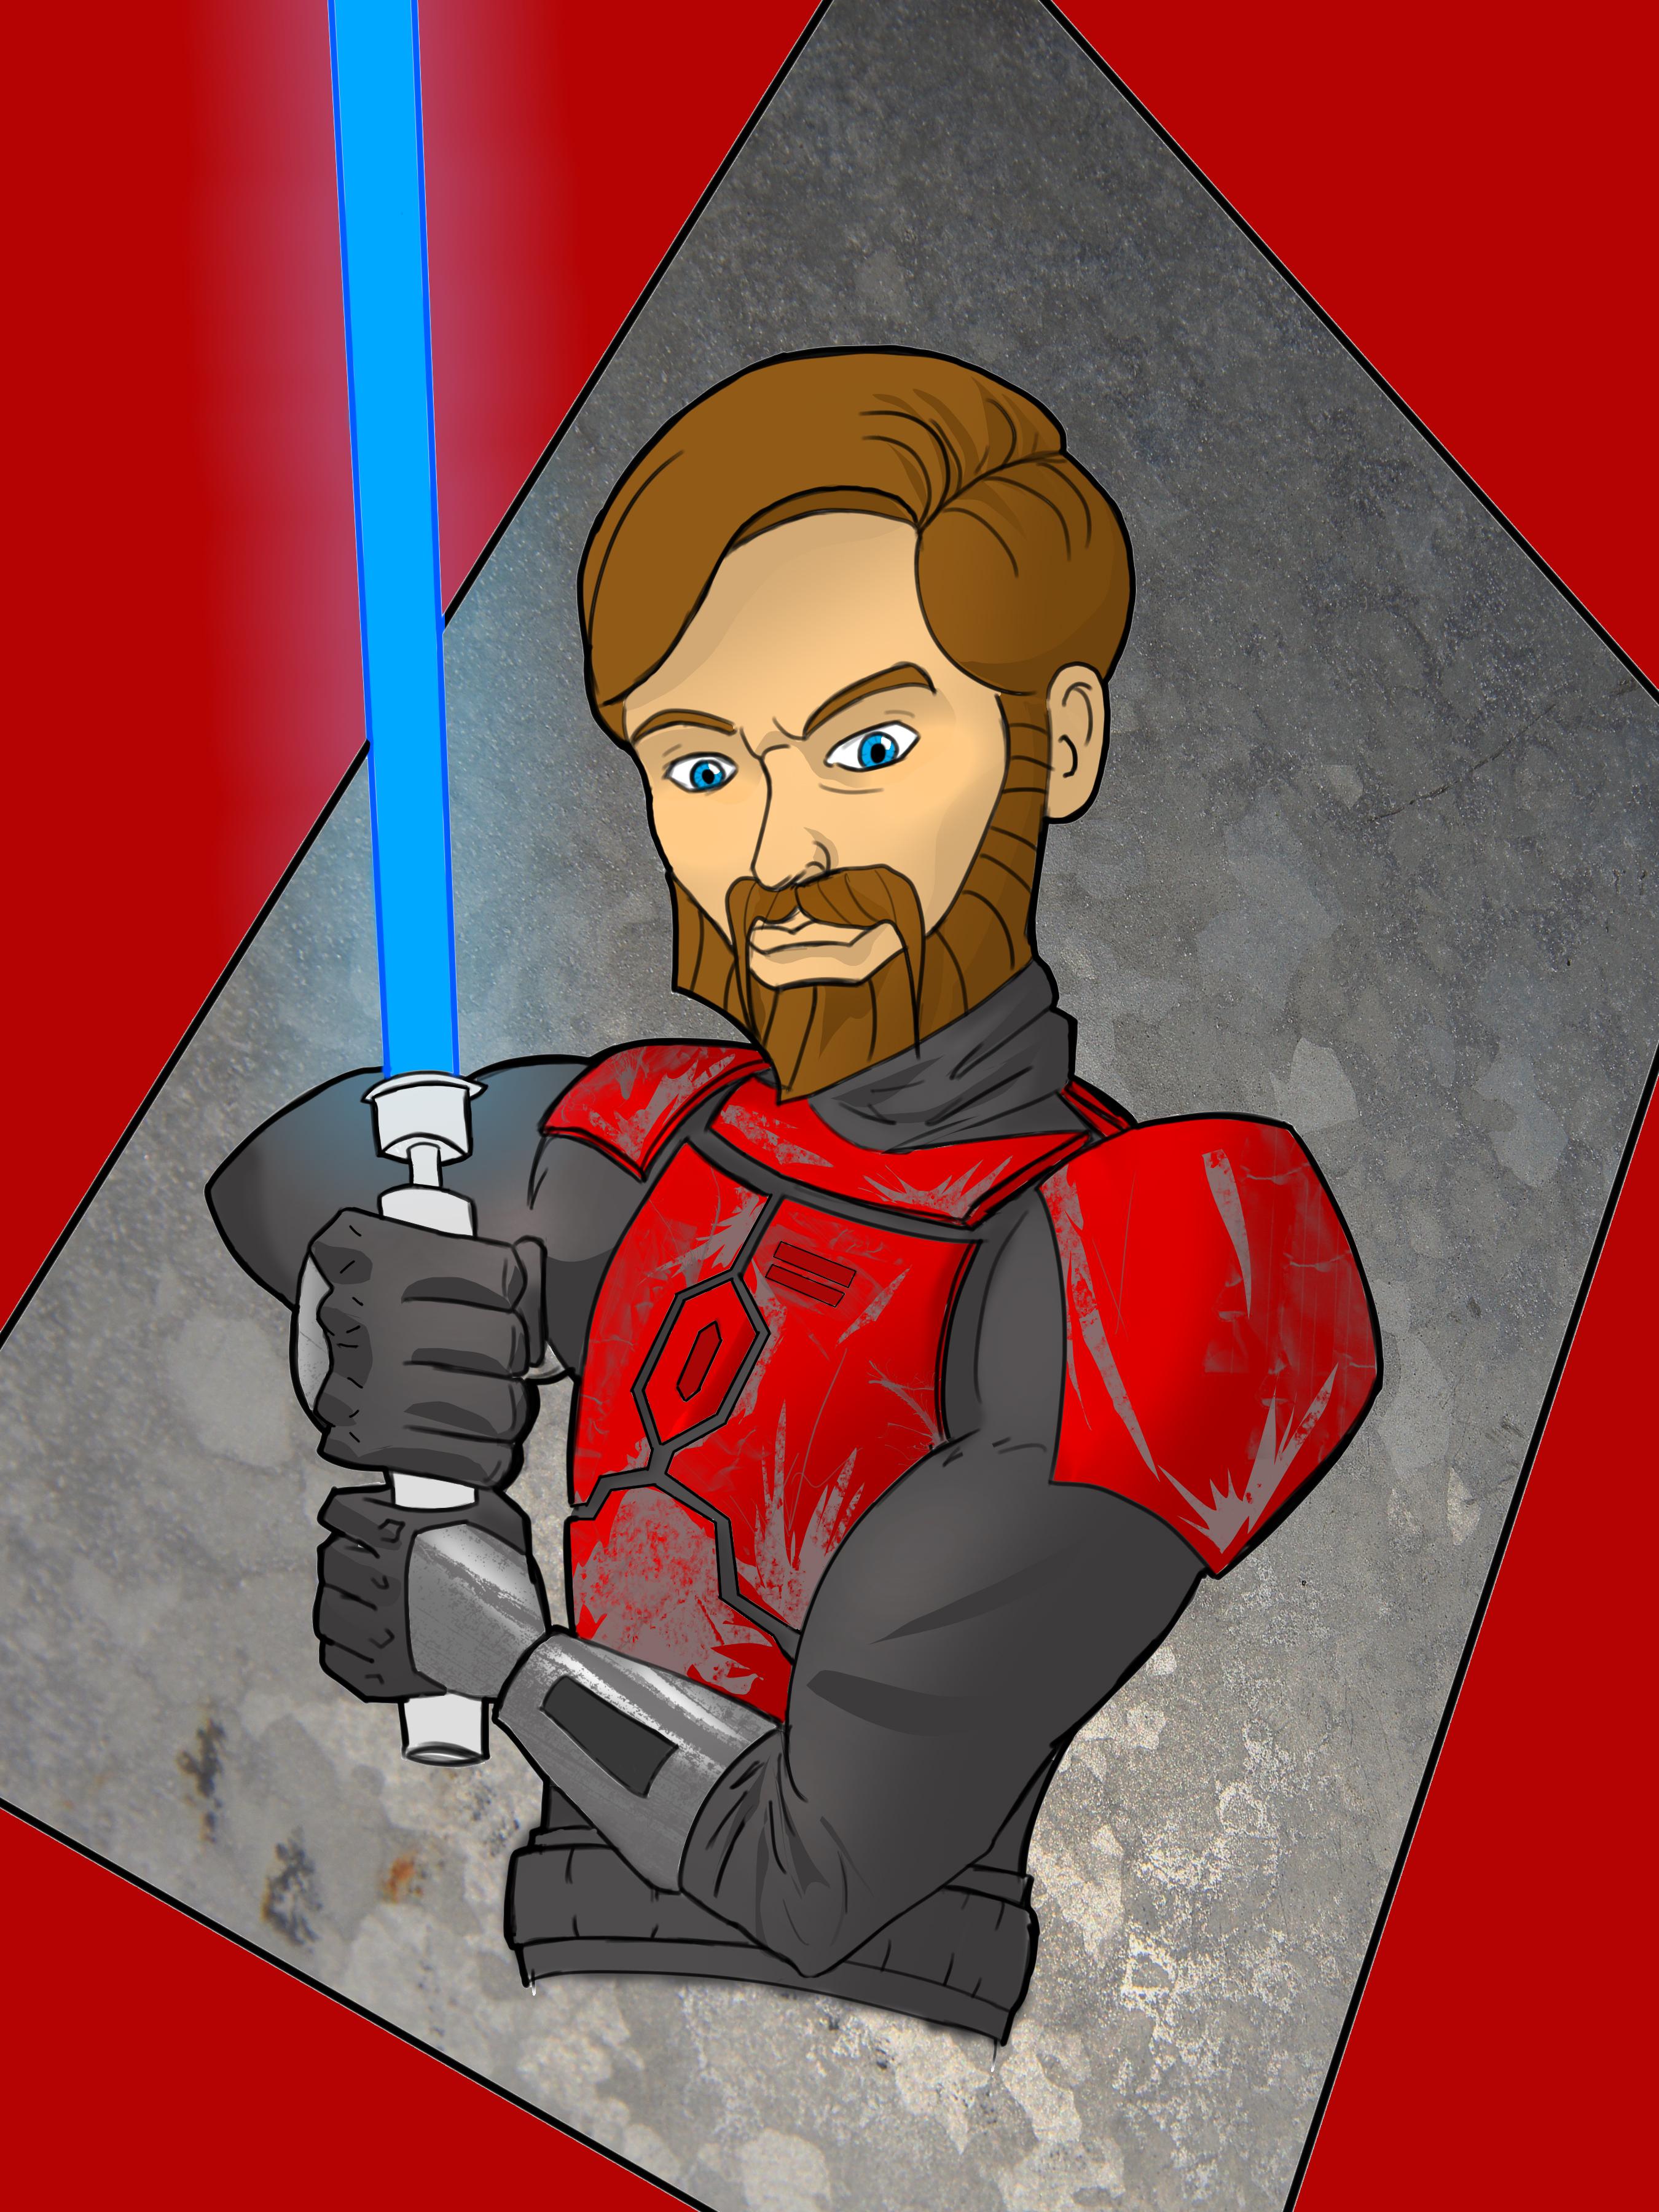 Obi wan rocking the red